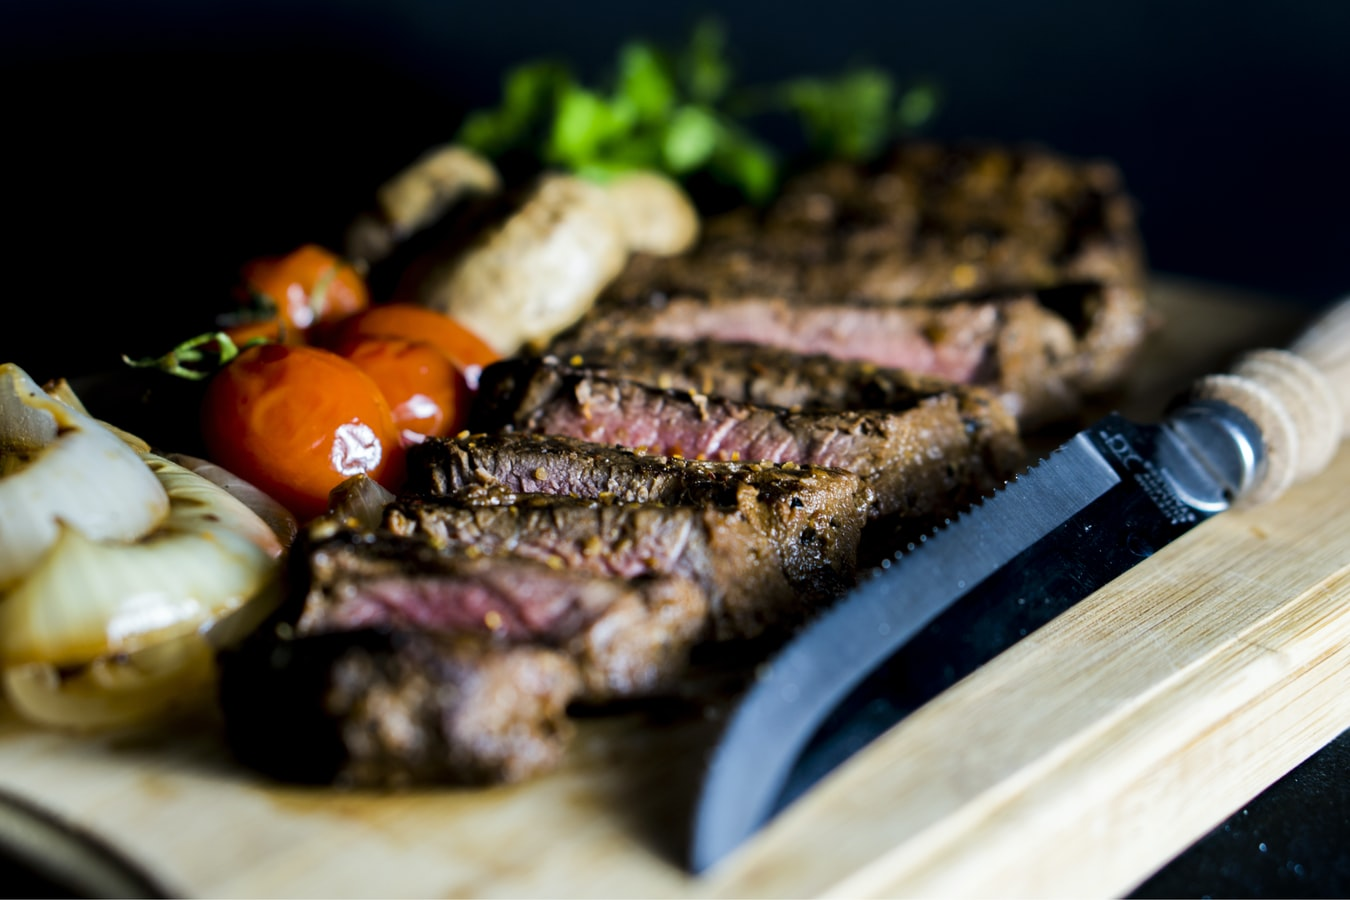 The best restaurants on Wolt for Cinco de Mayo in Tel Aviv